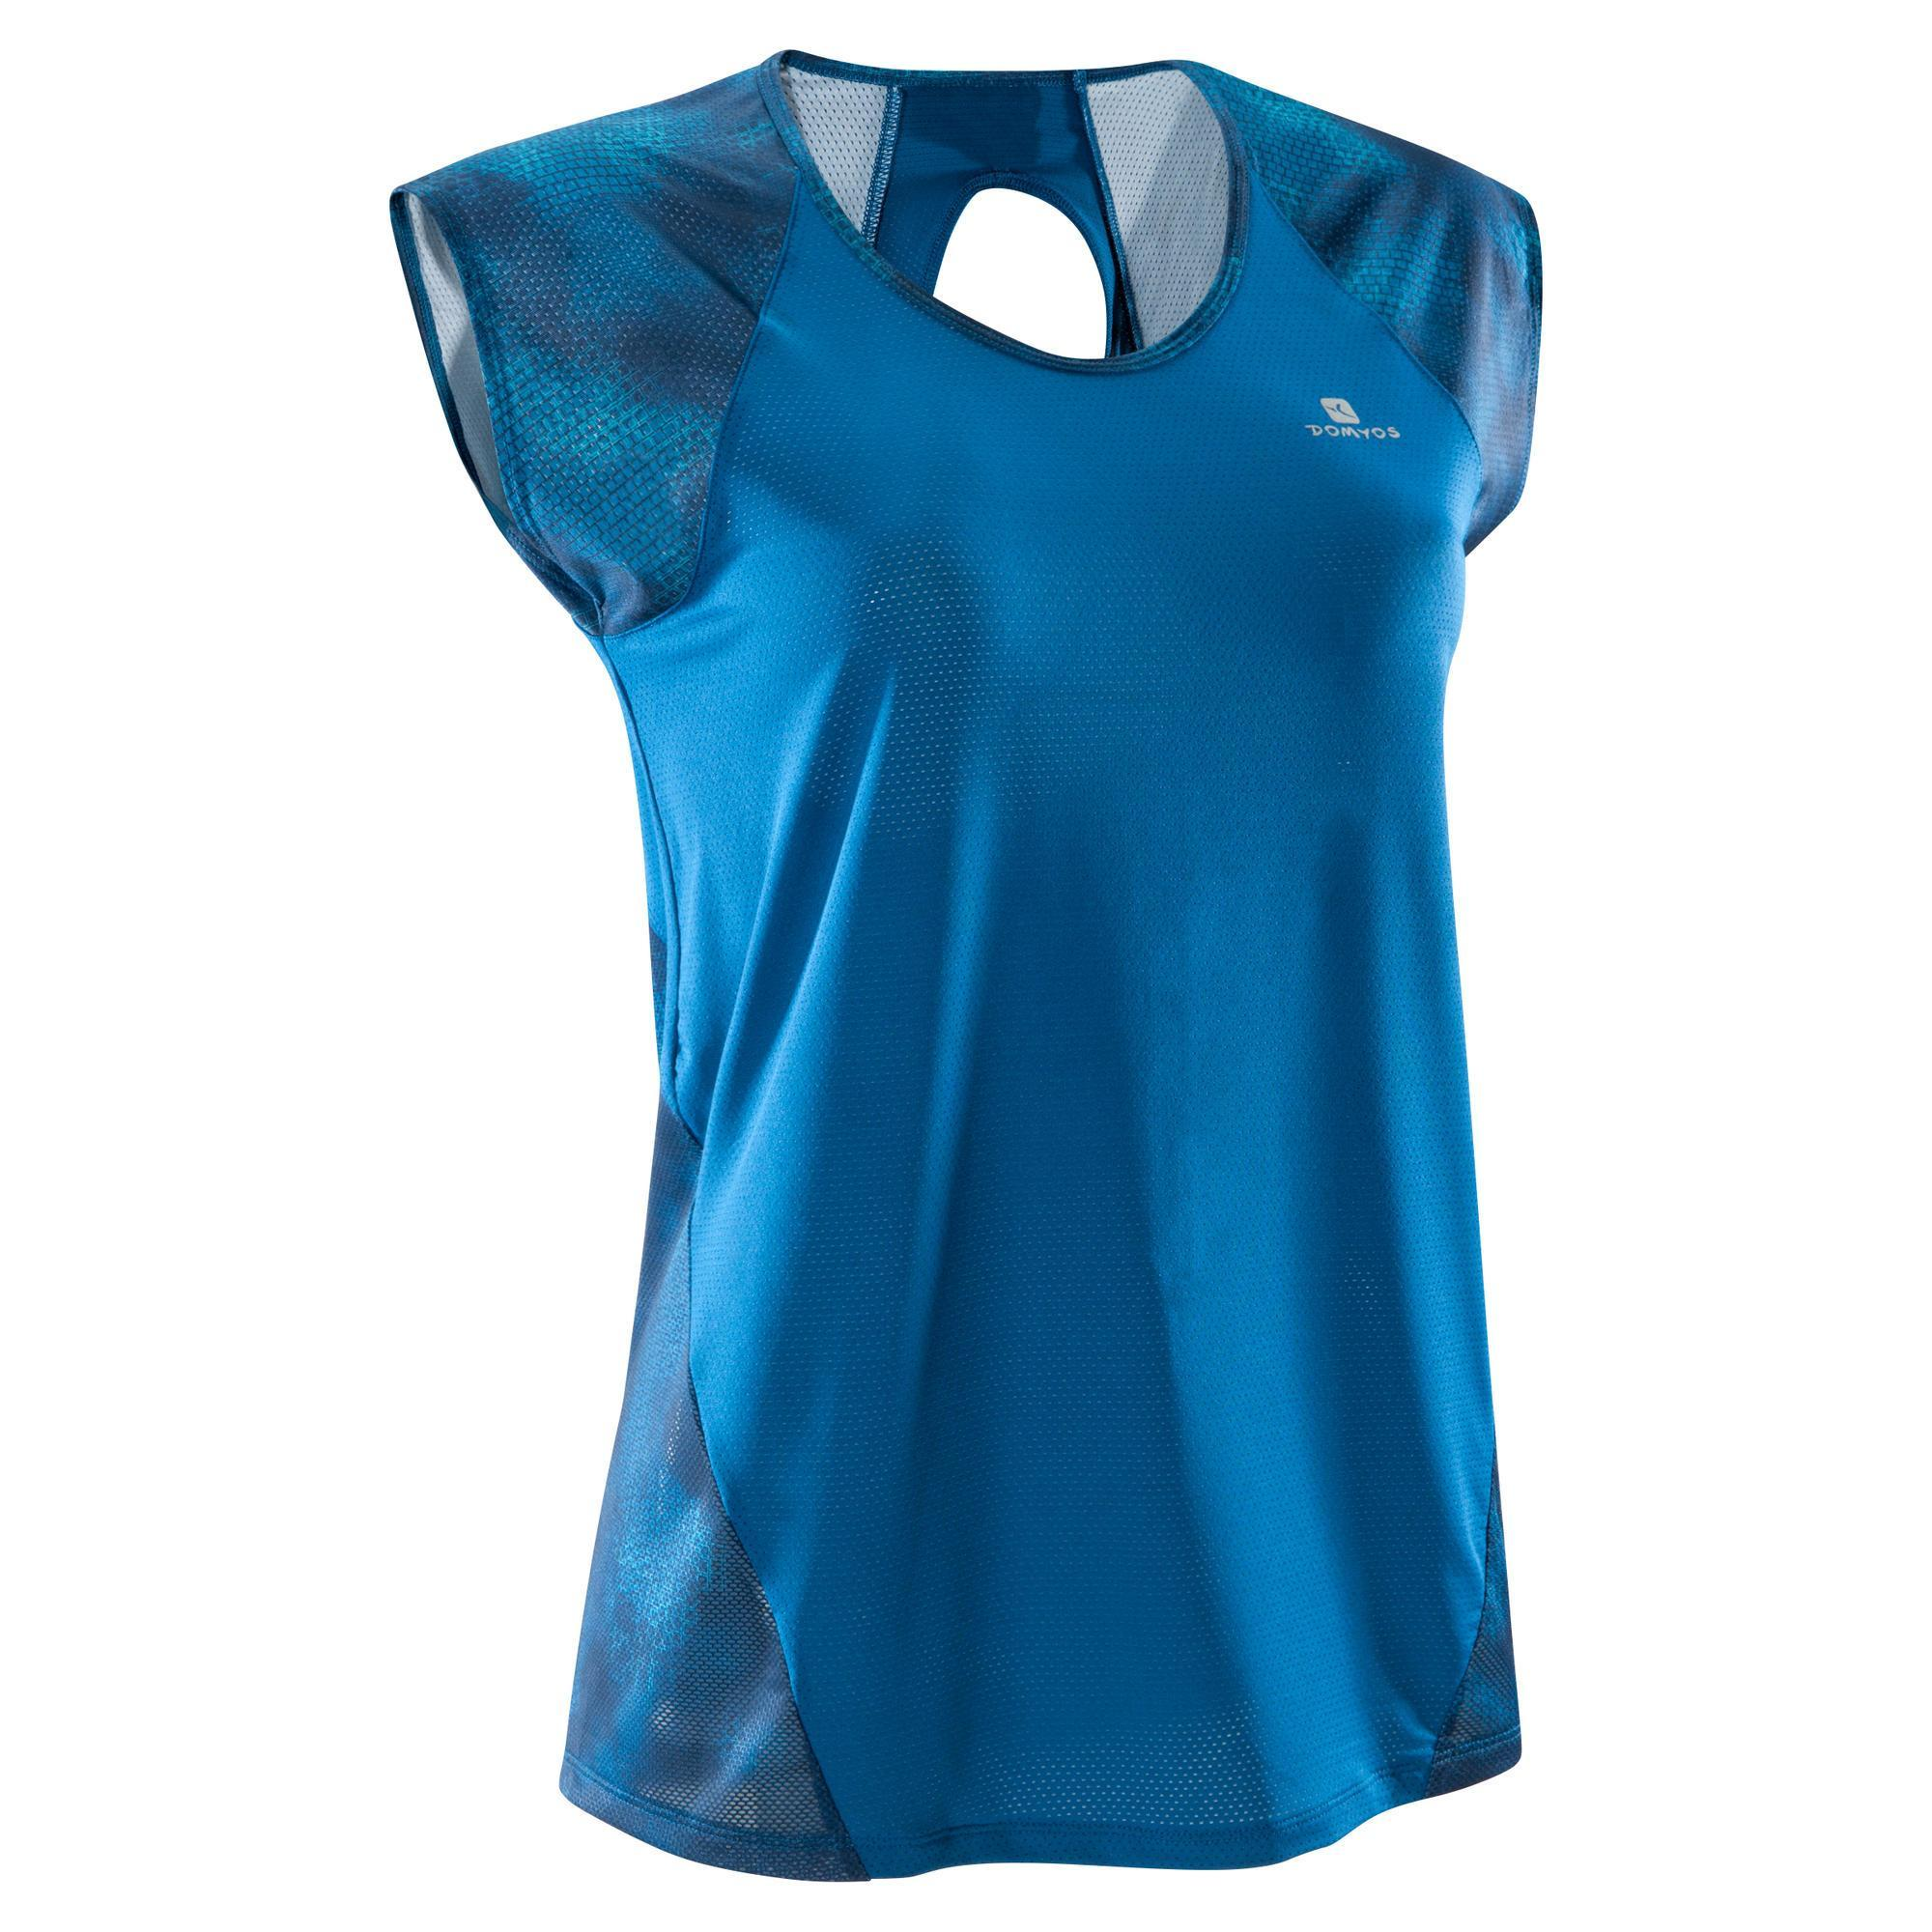 Domyos T-shirt cardiofitness dames marineblauw roze prints 500 Domyos